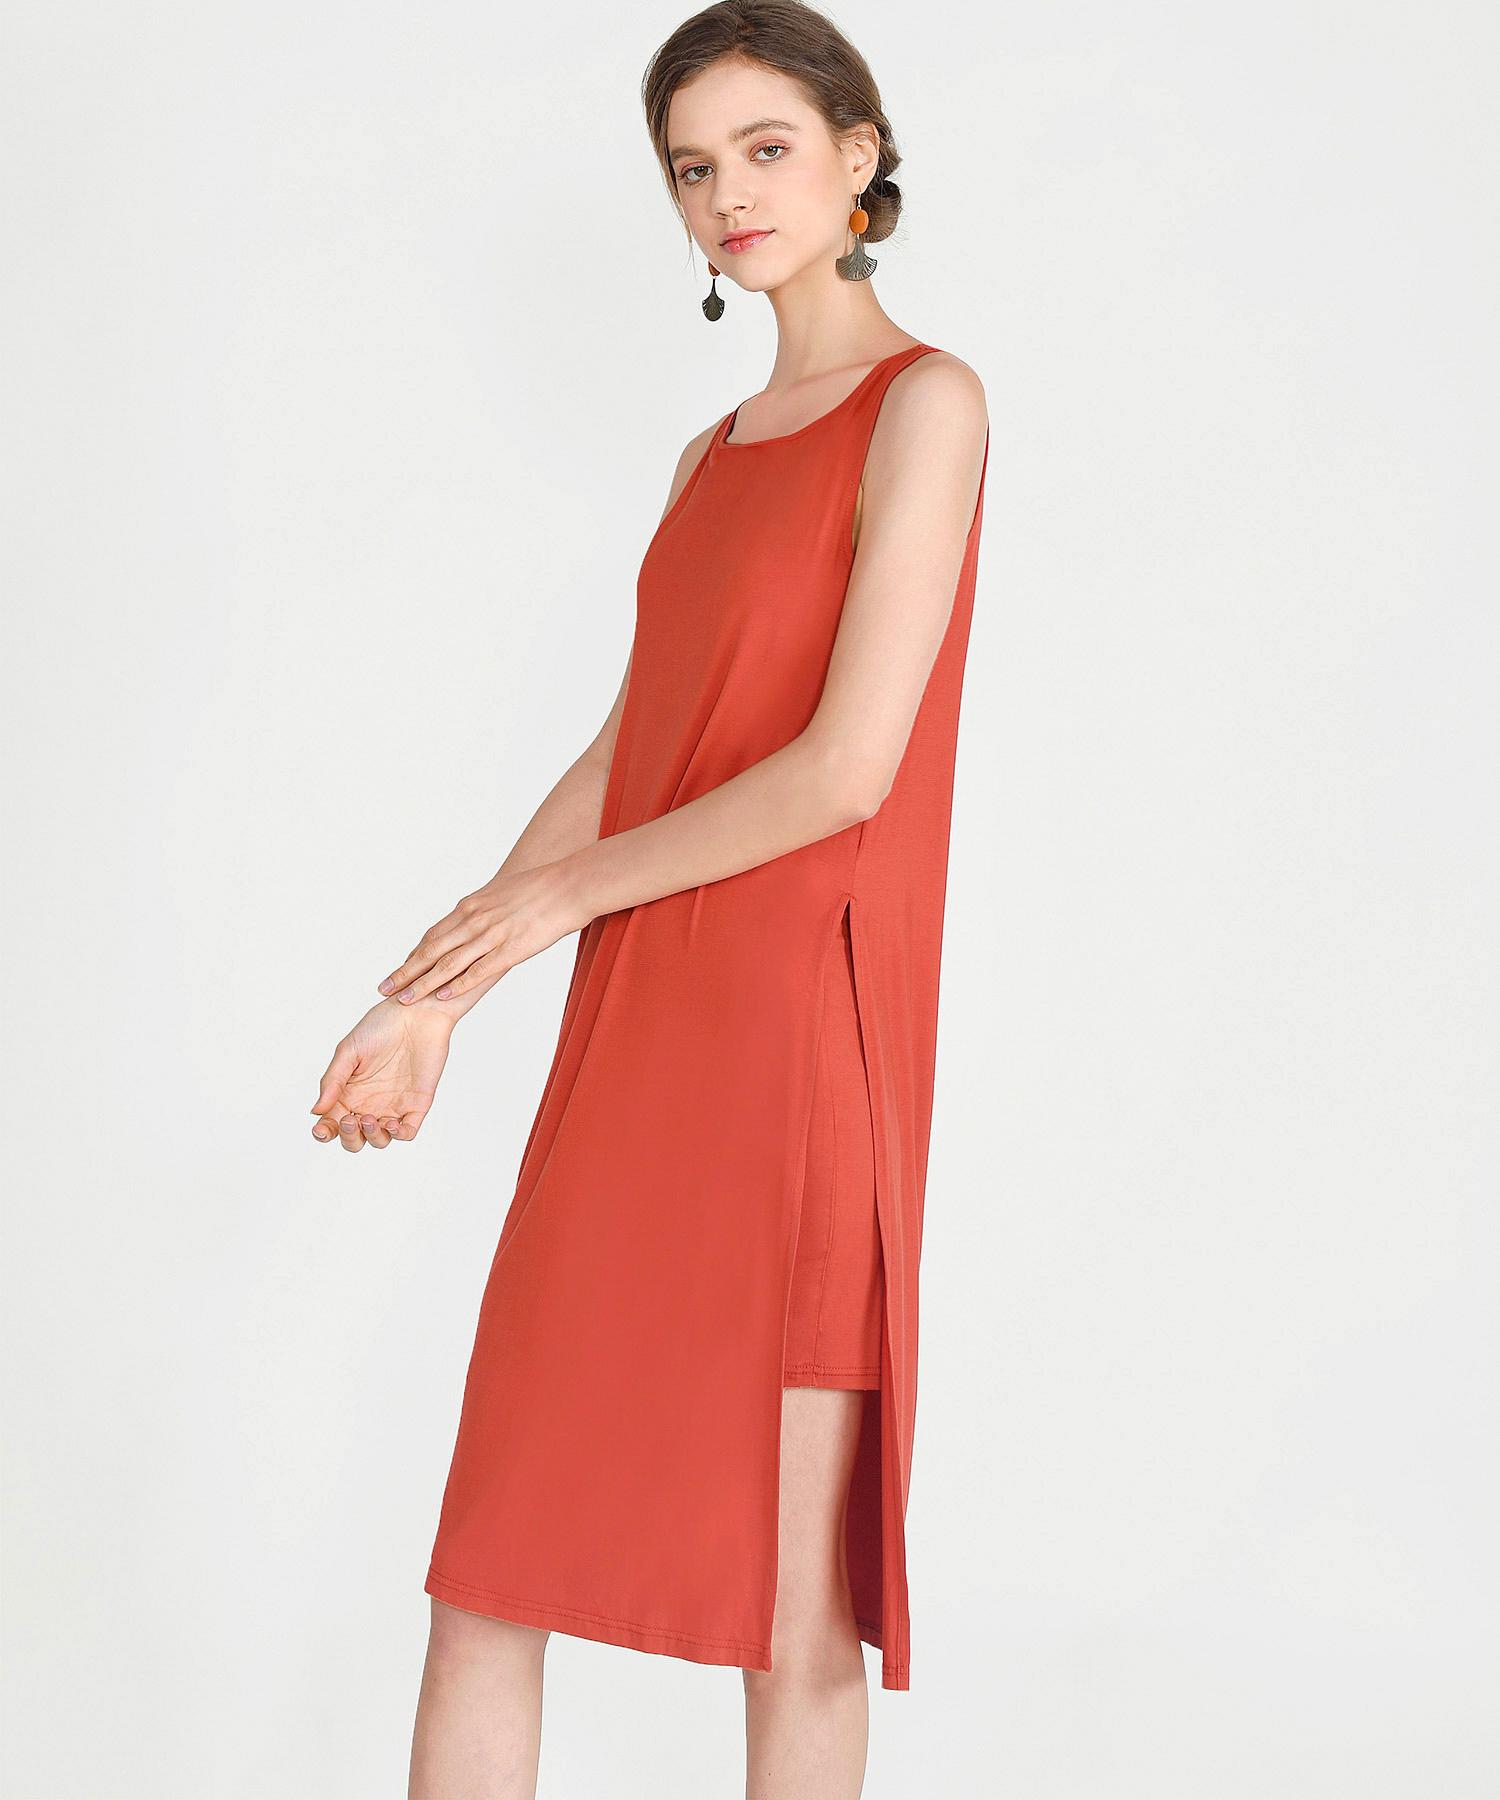 midas-midi-dress-vermillion-1